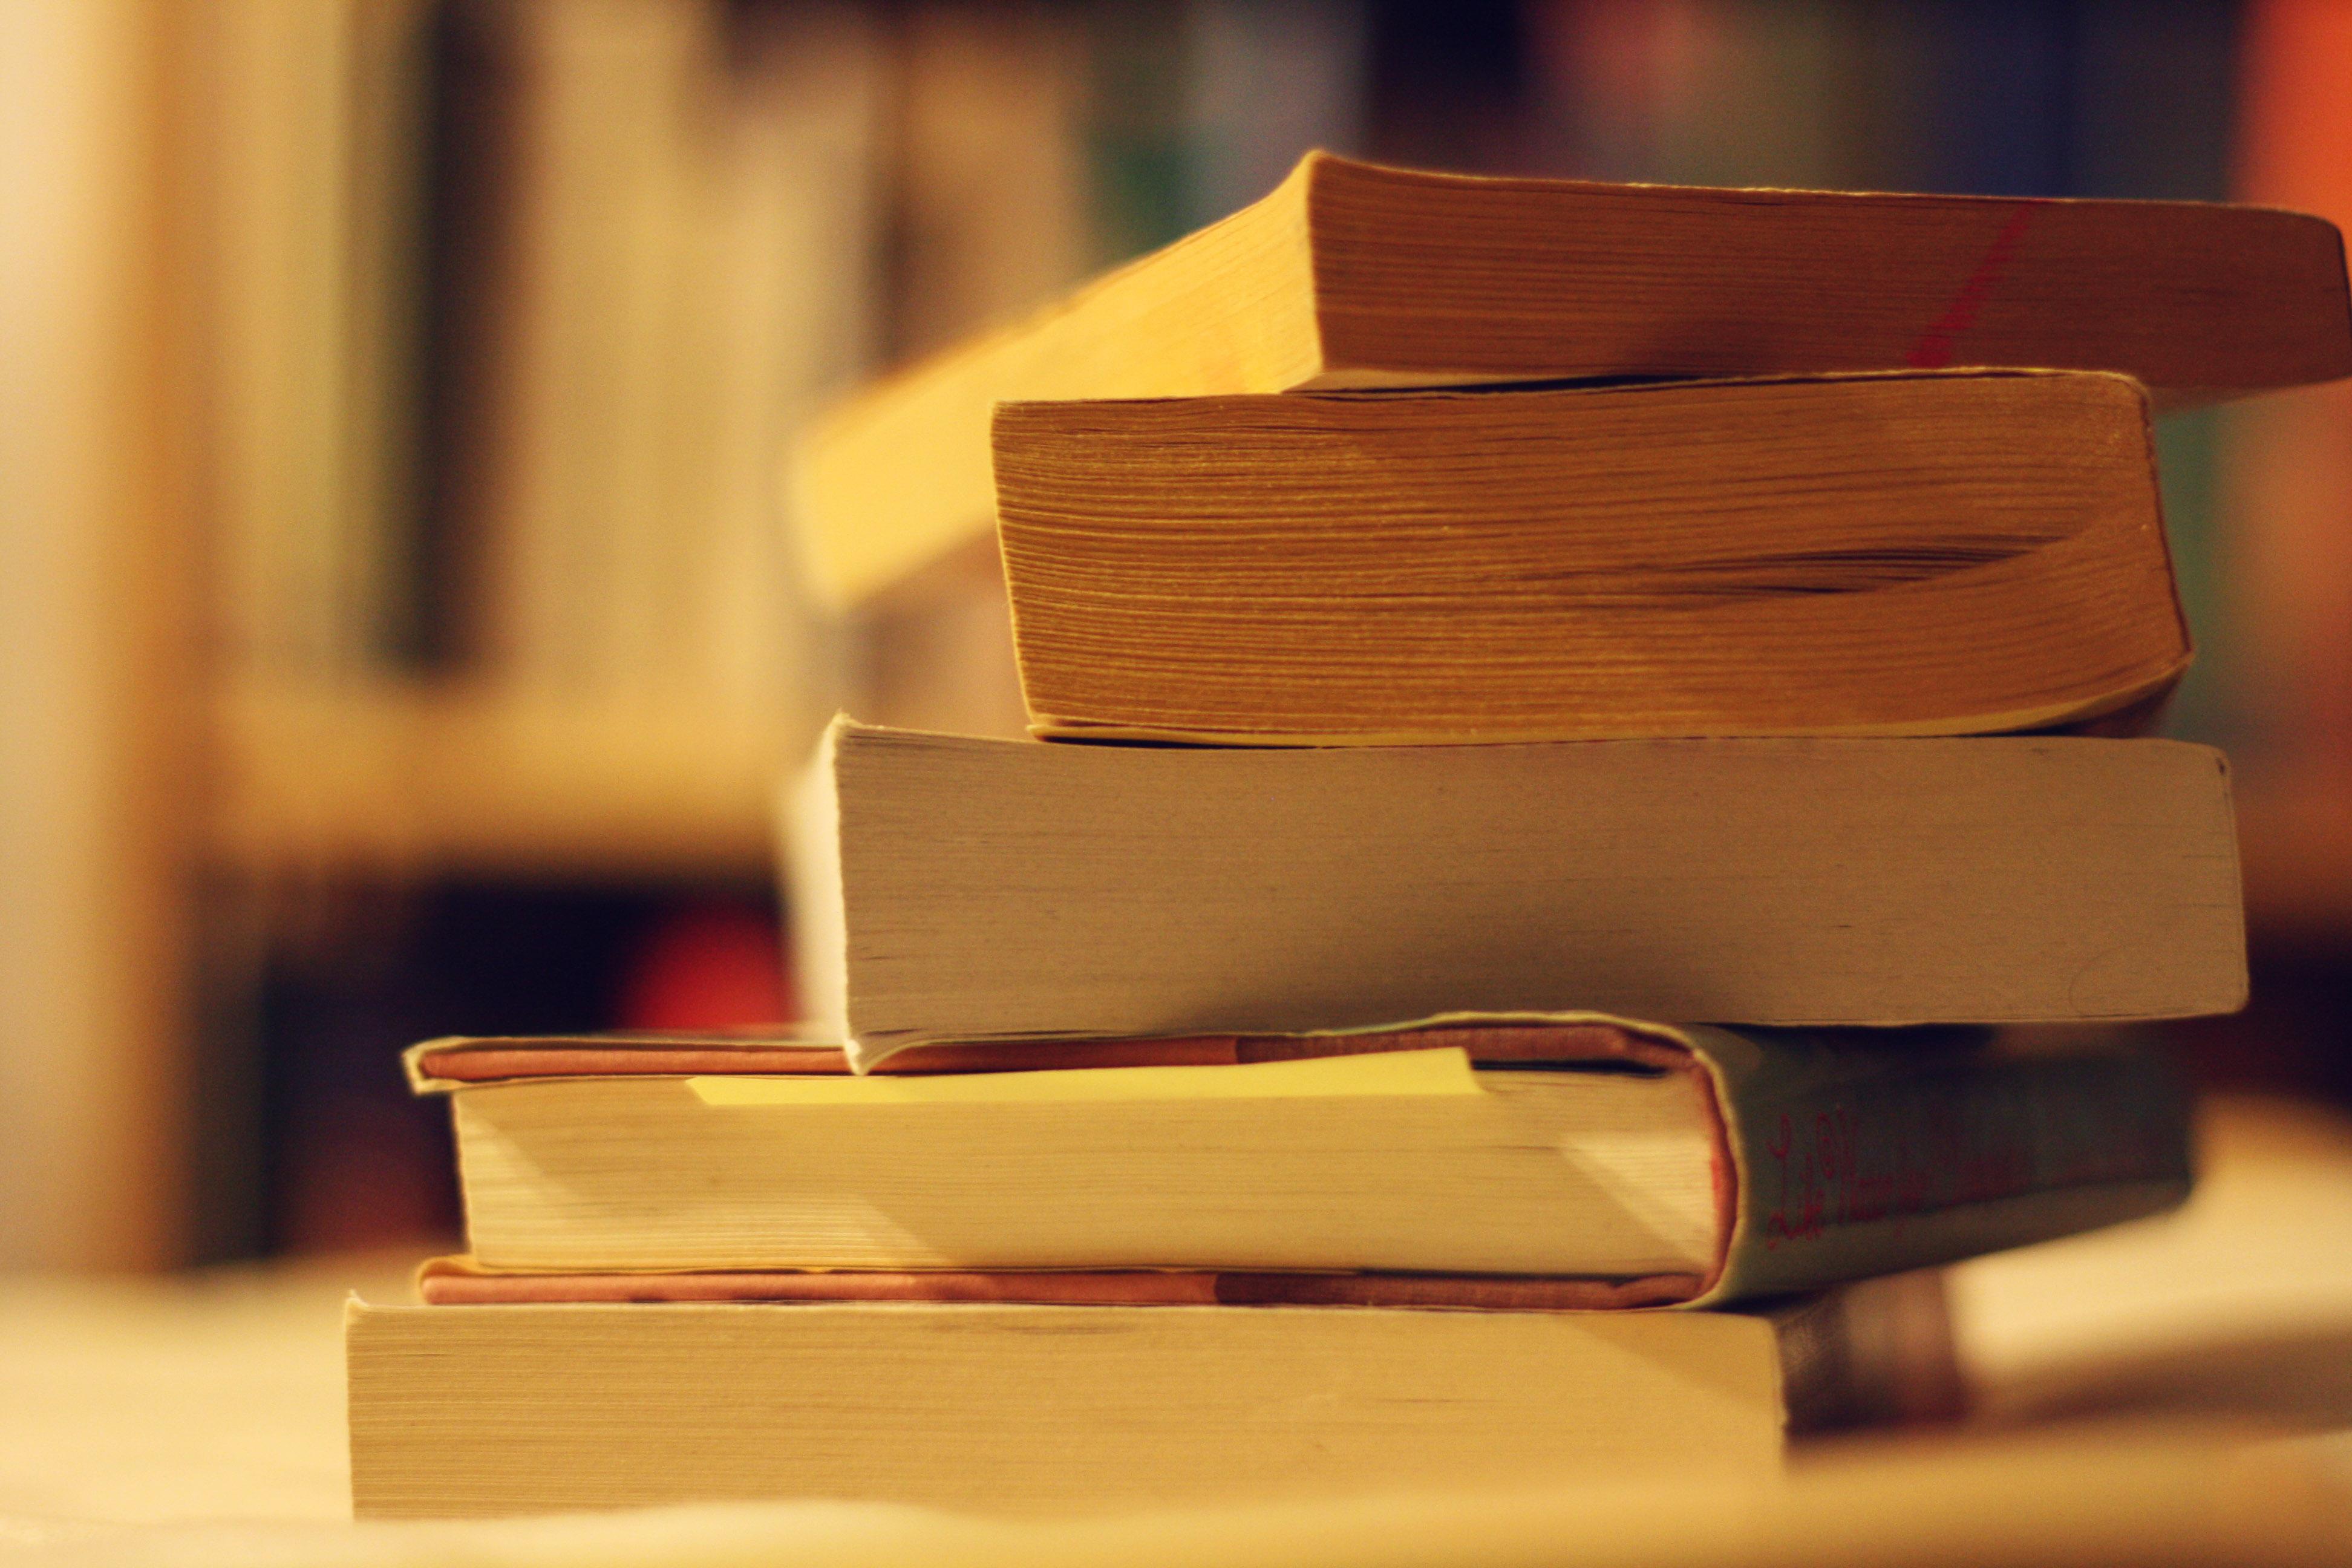 Купуйте онлайн та отримуйте книги поштою